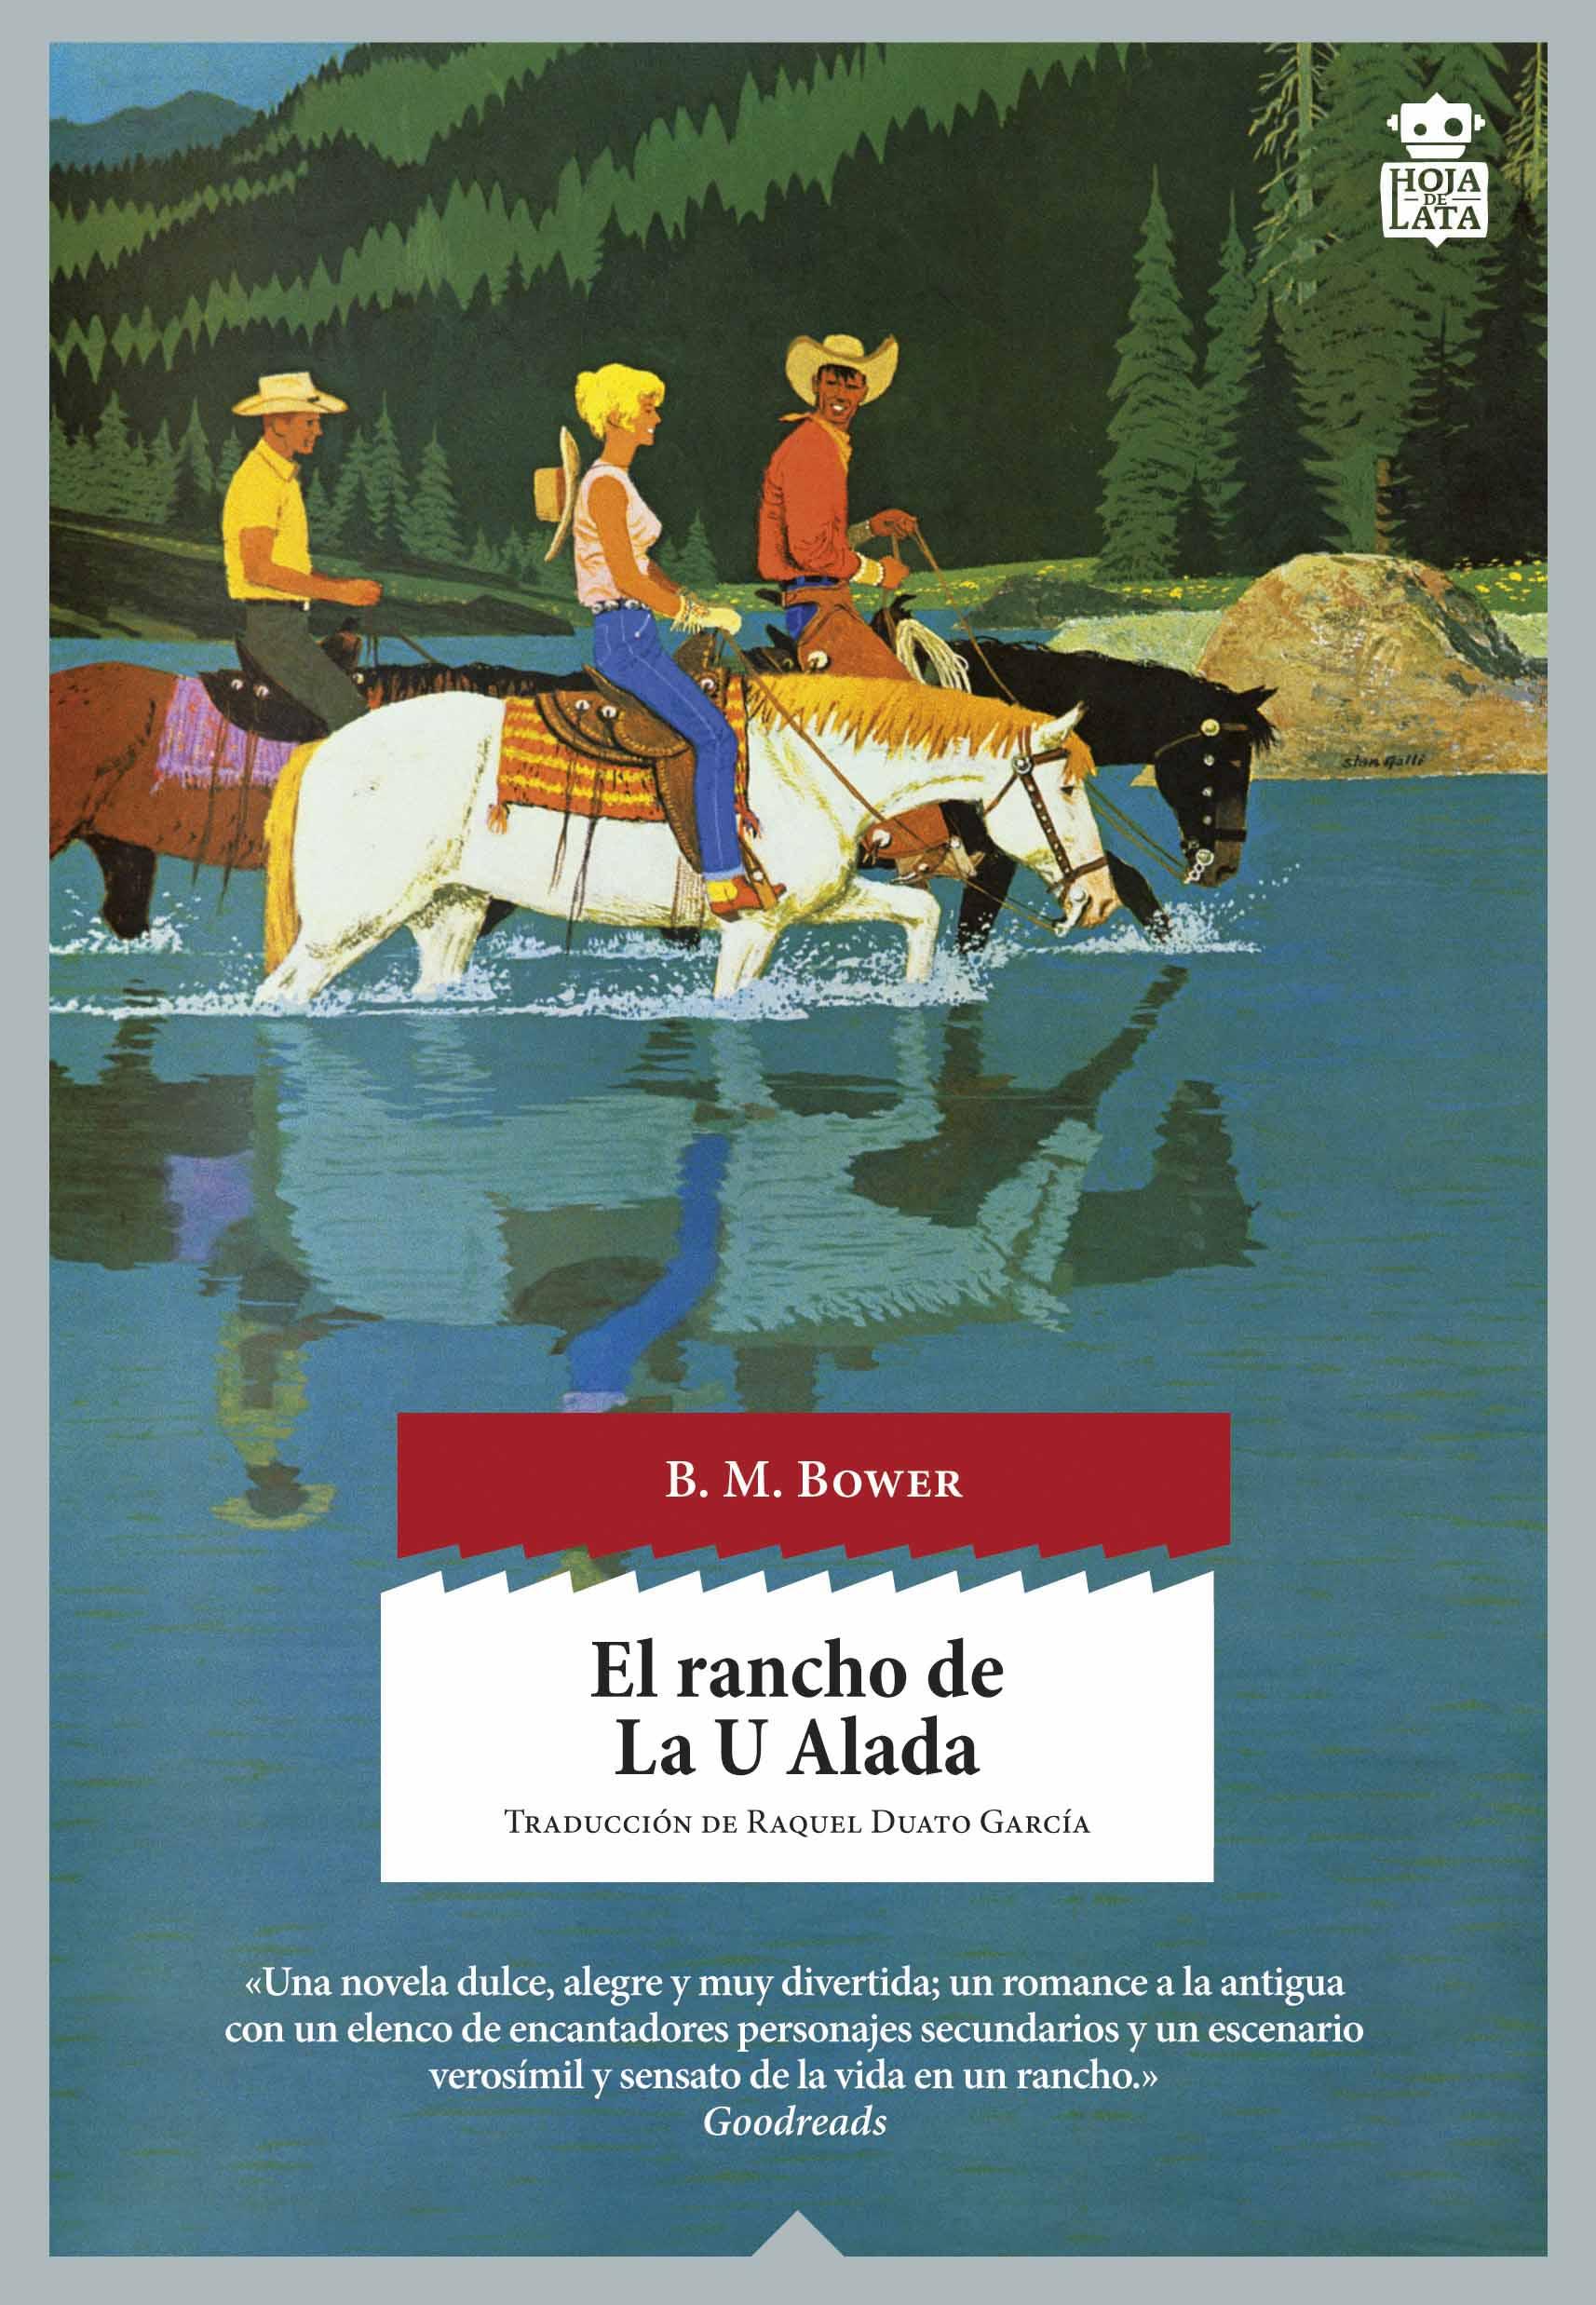 El rancho de La U Alada